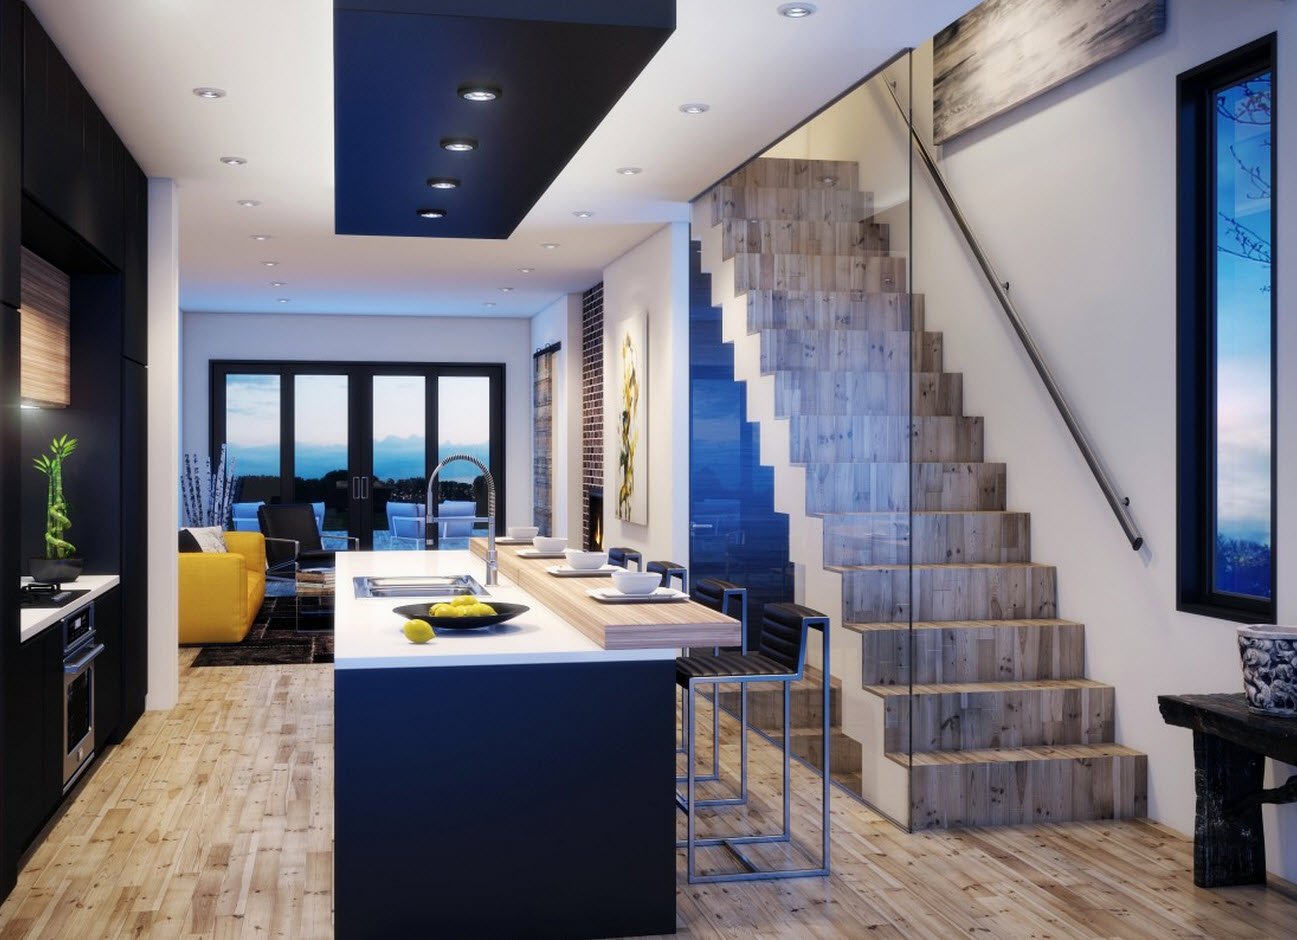 Planos casa dos pisos angosta y larga Diseo